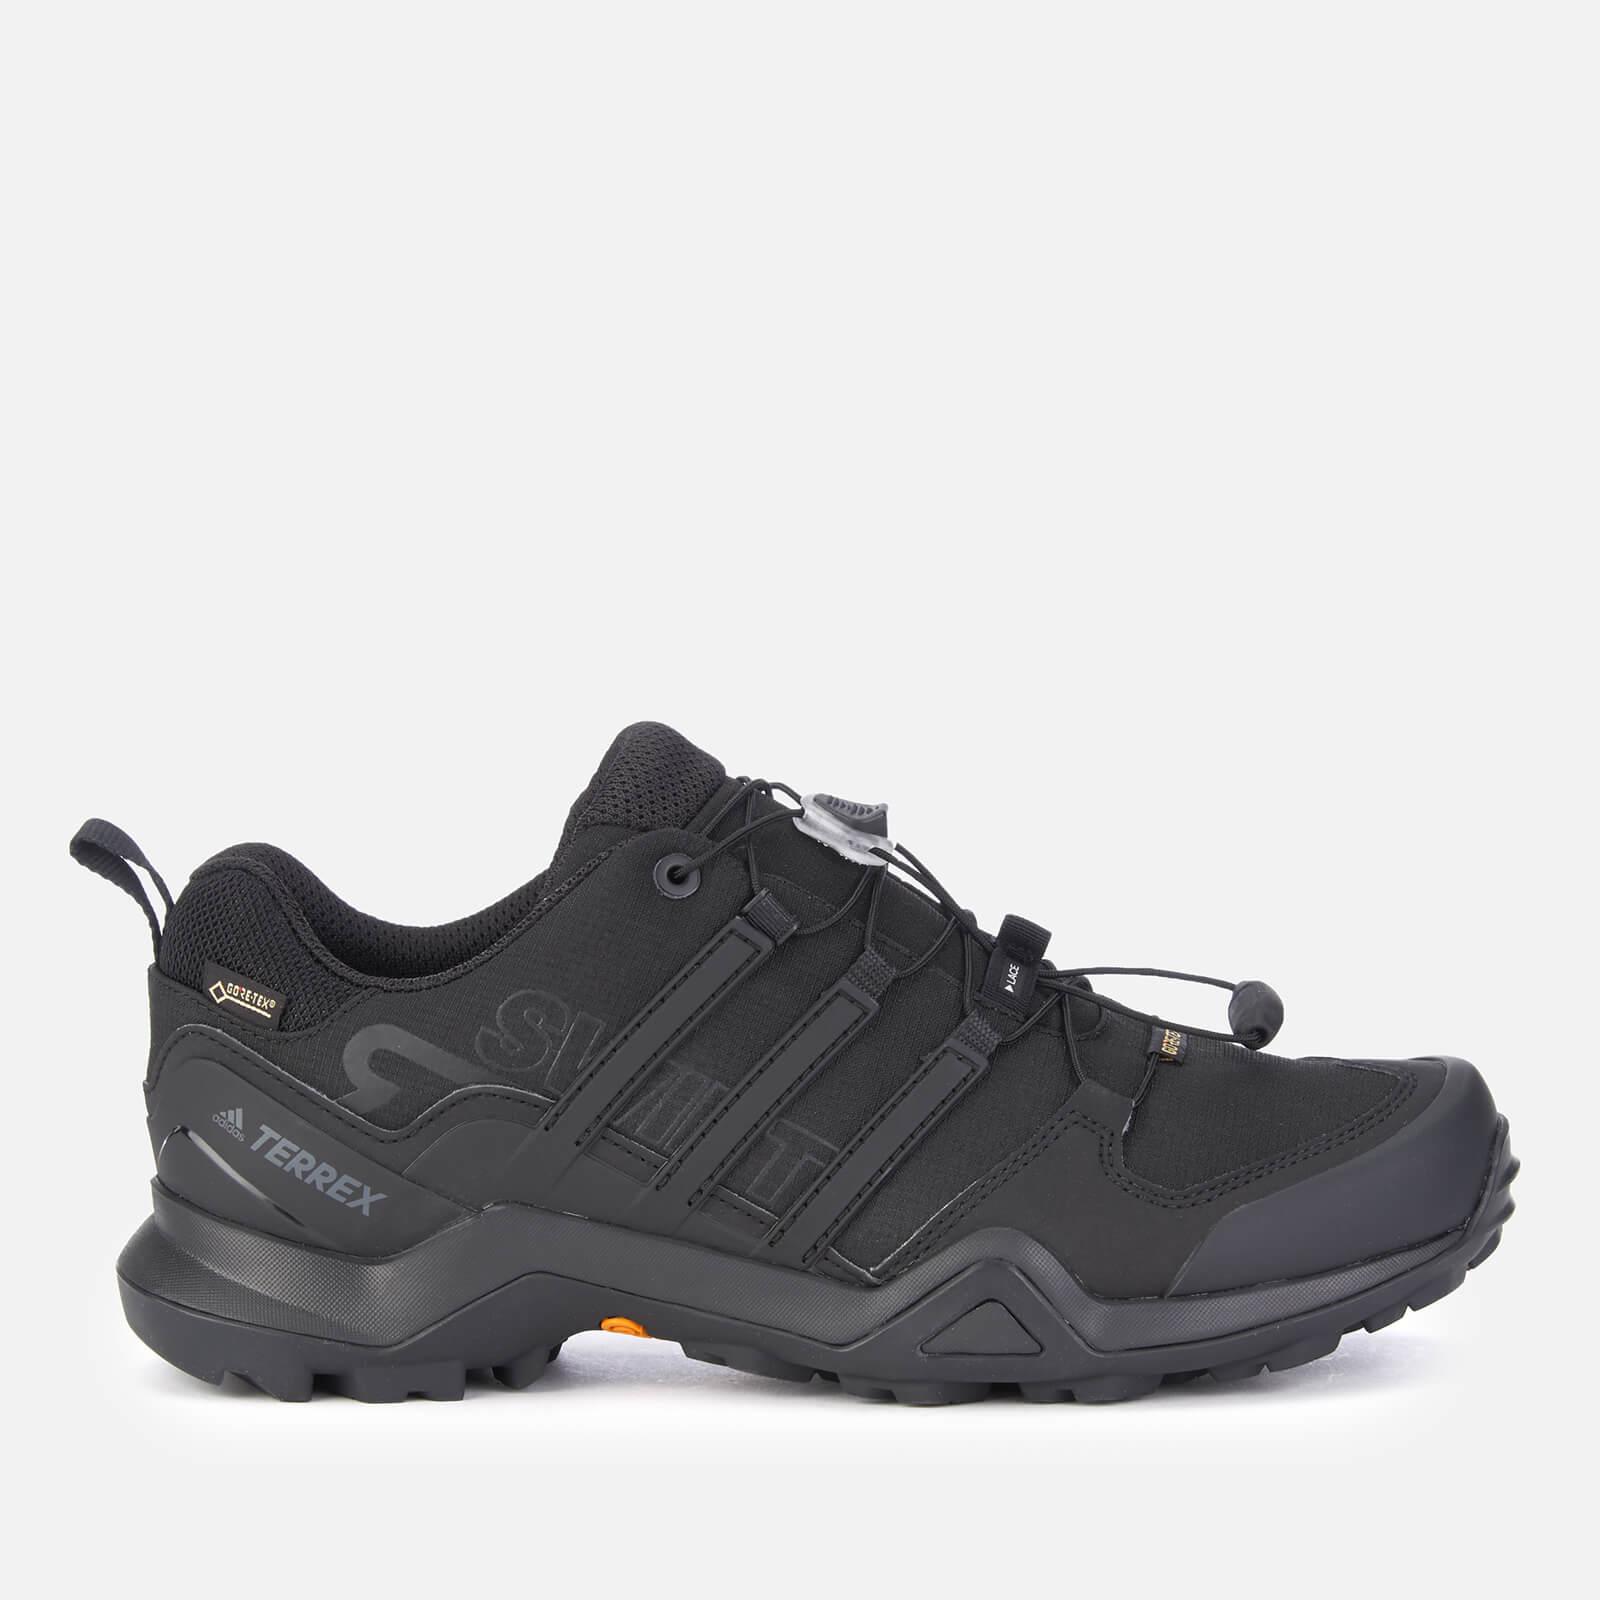 3e71a0234 adidas Men's Terrex Swift R2 Goretex Hiking Shoes - Black